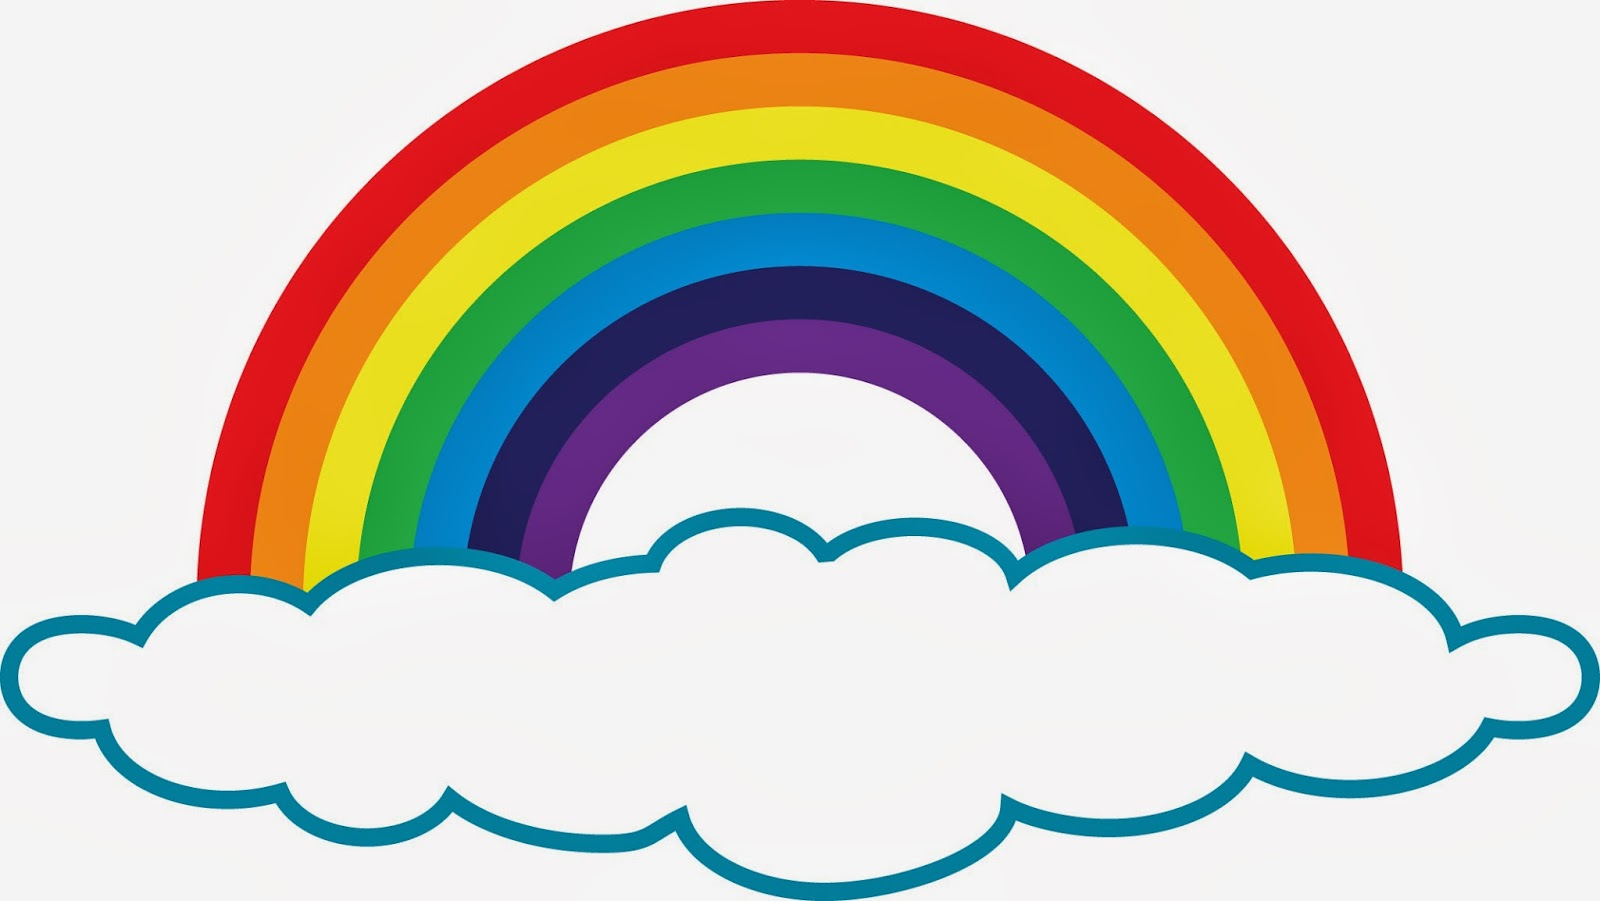 Black and white rainbow outline free cli-Black and white rainbow outline free clipart images-1